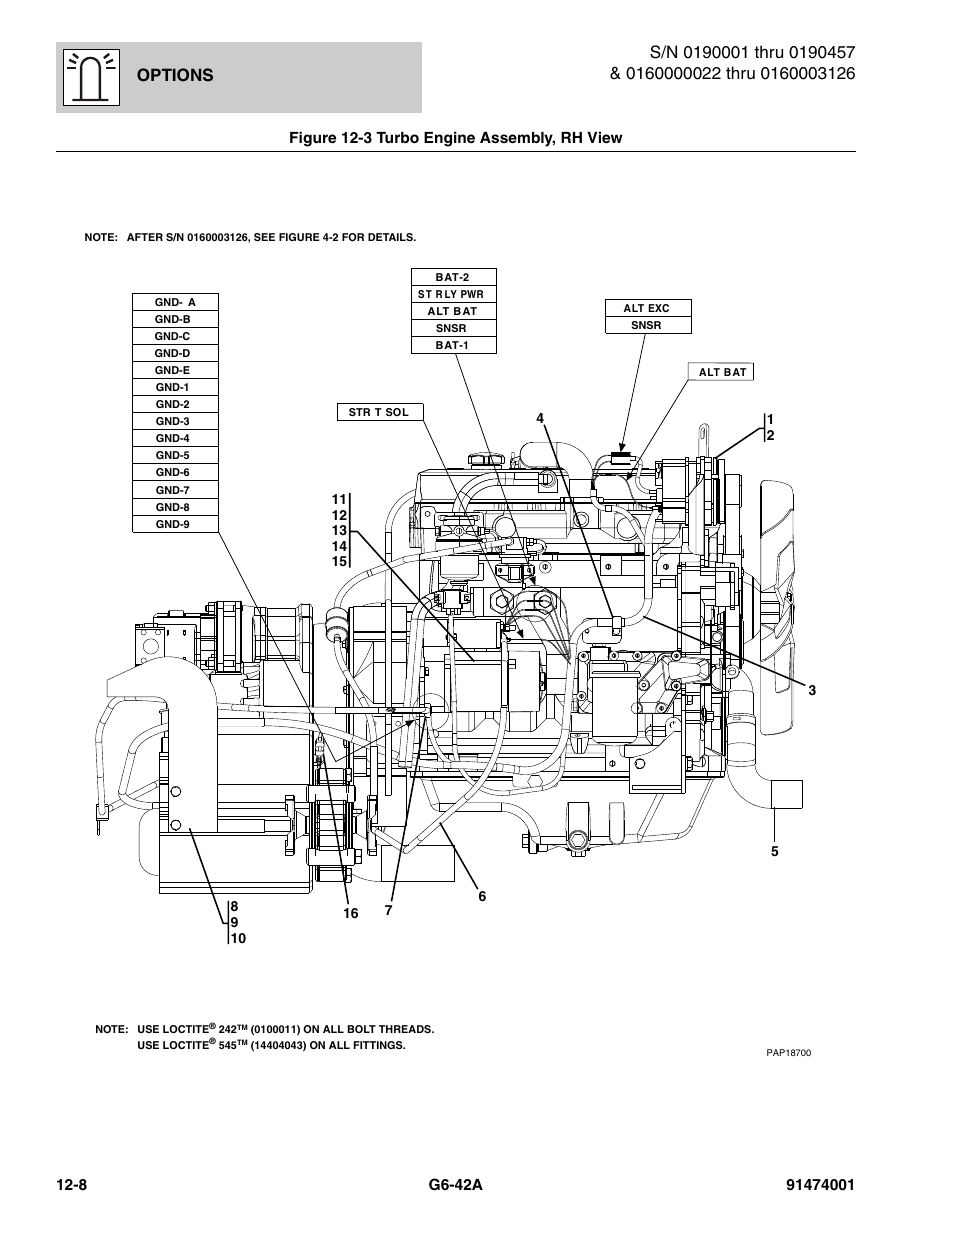 Figure 12-3 turbo engine assembly, rh view, Turbo engine